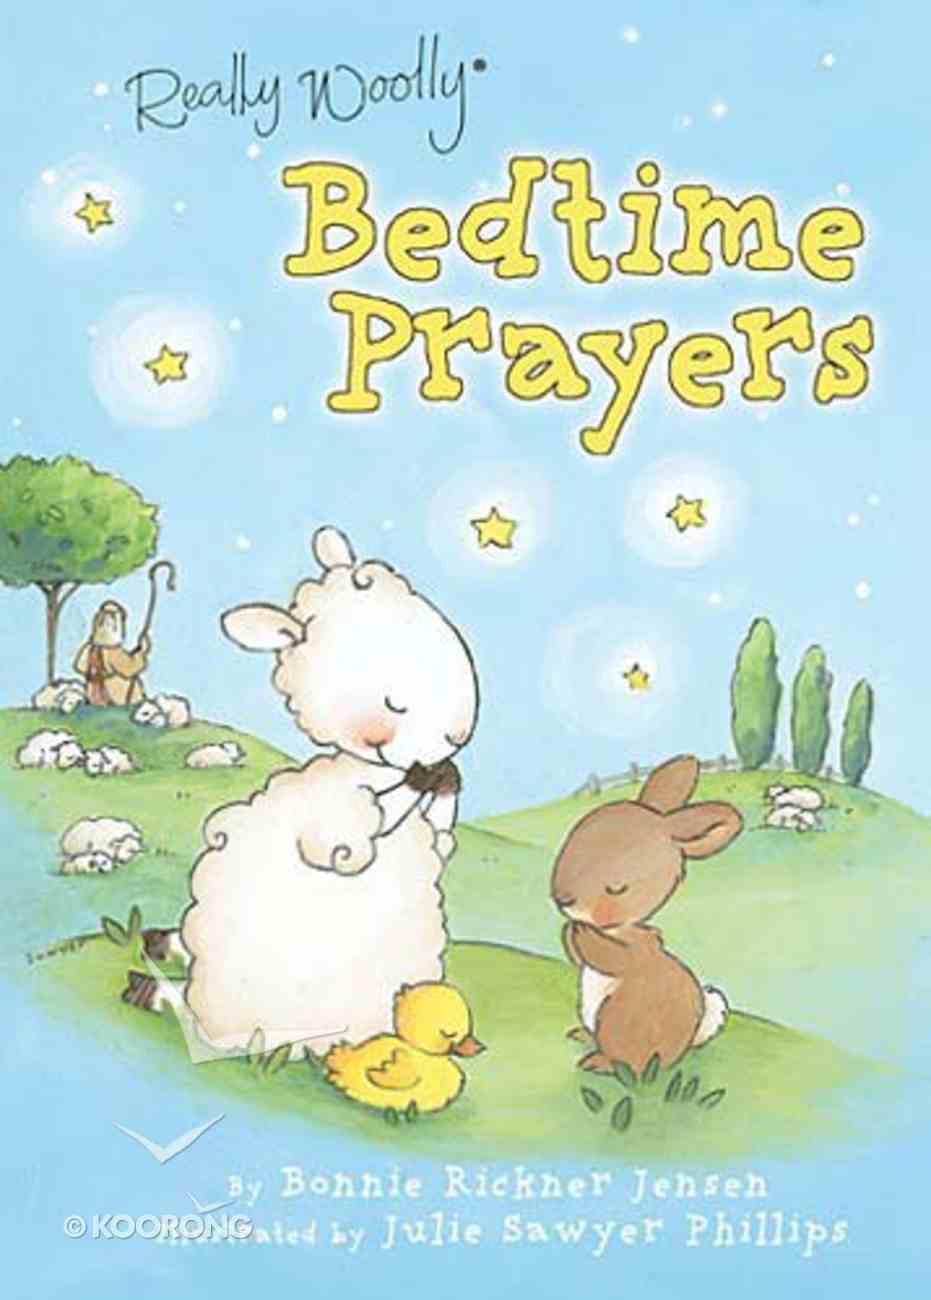 Bedtime Prayers (Really Woolly Series) Board Book